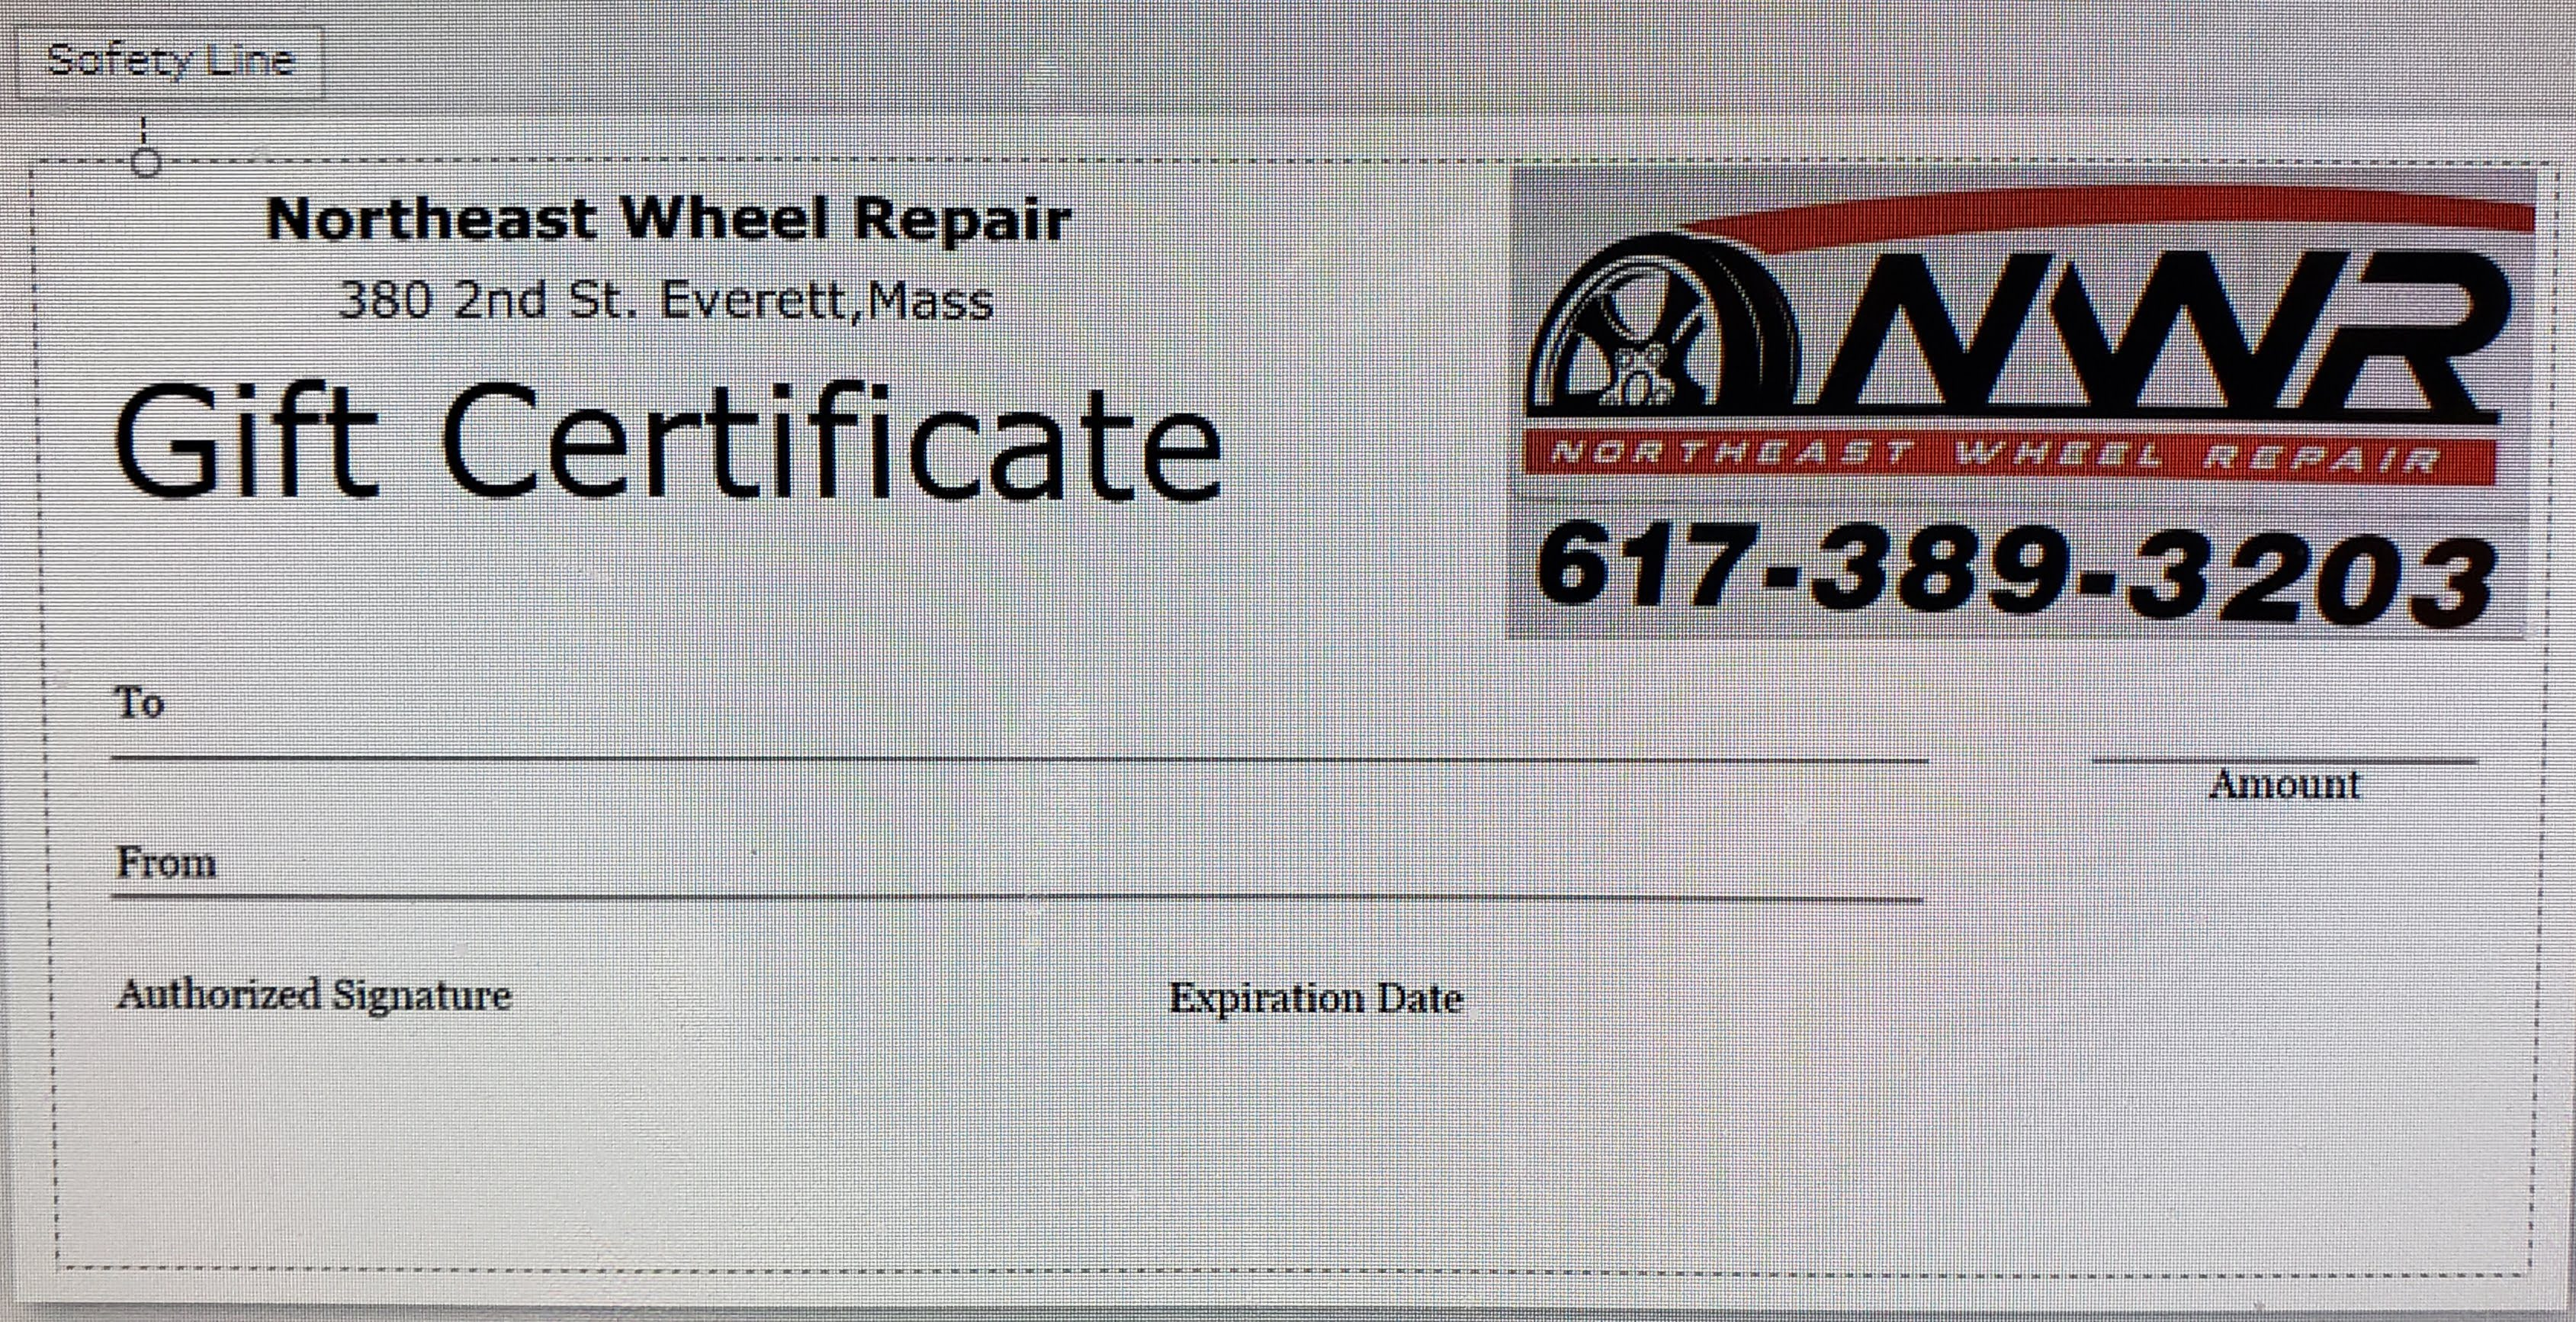 Northeast Wheel Repair Gift Certificate, Holiday Specials